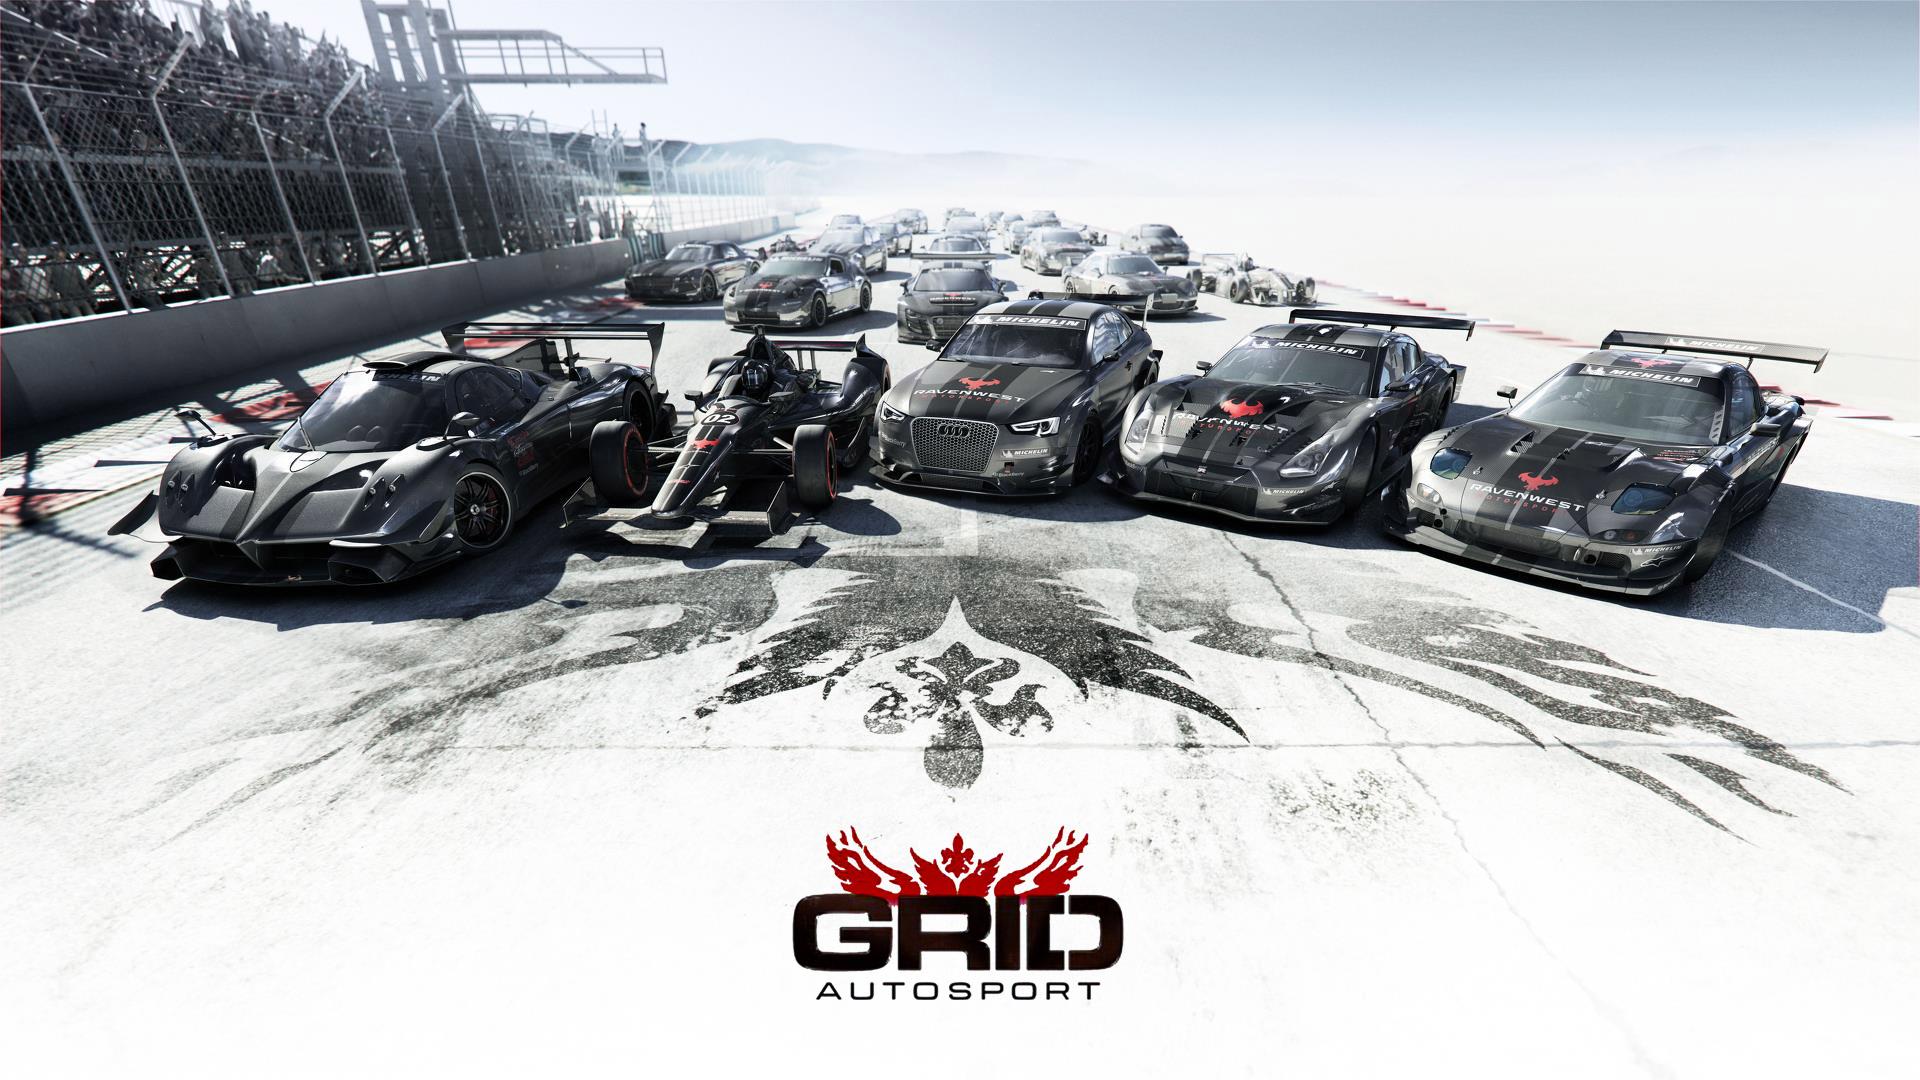 Grid Autosport wallpaper 1